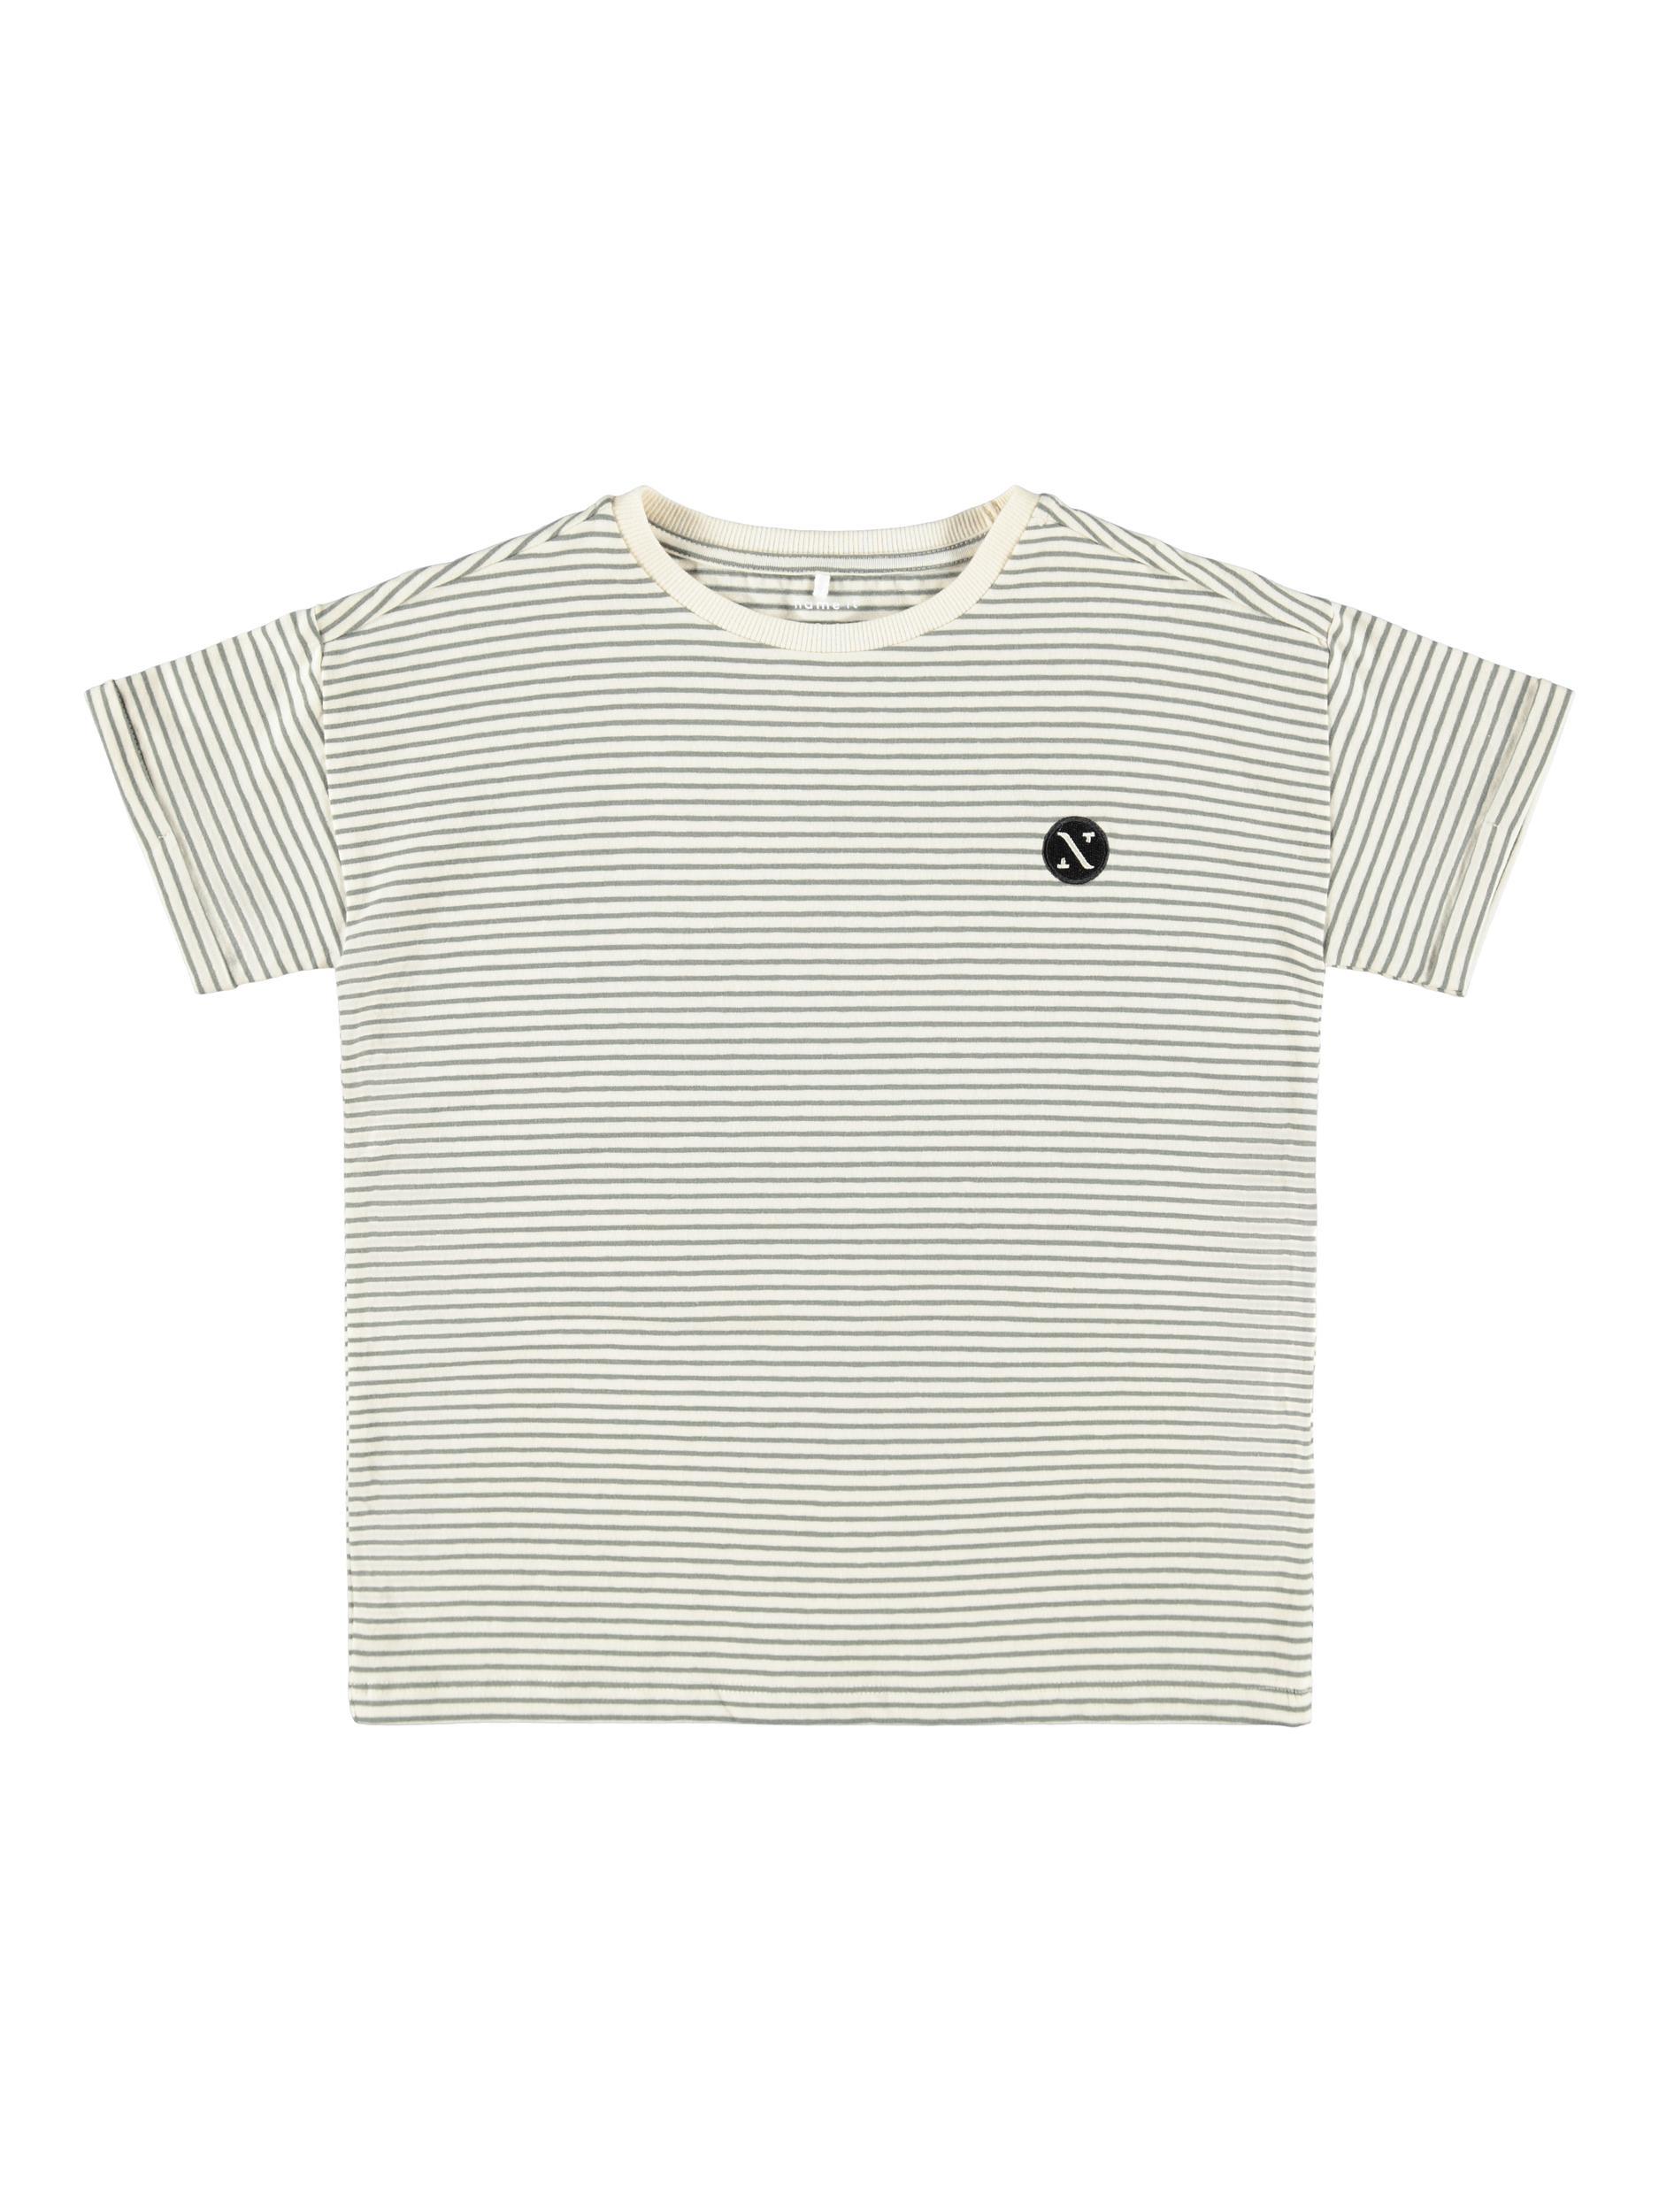 Name It Hugos SS boxy t-shirt